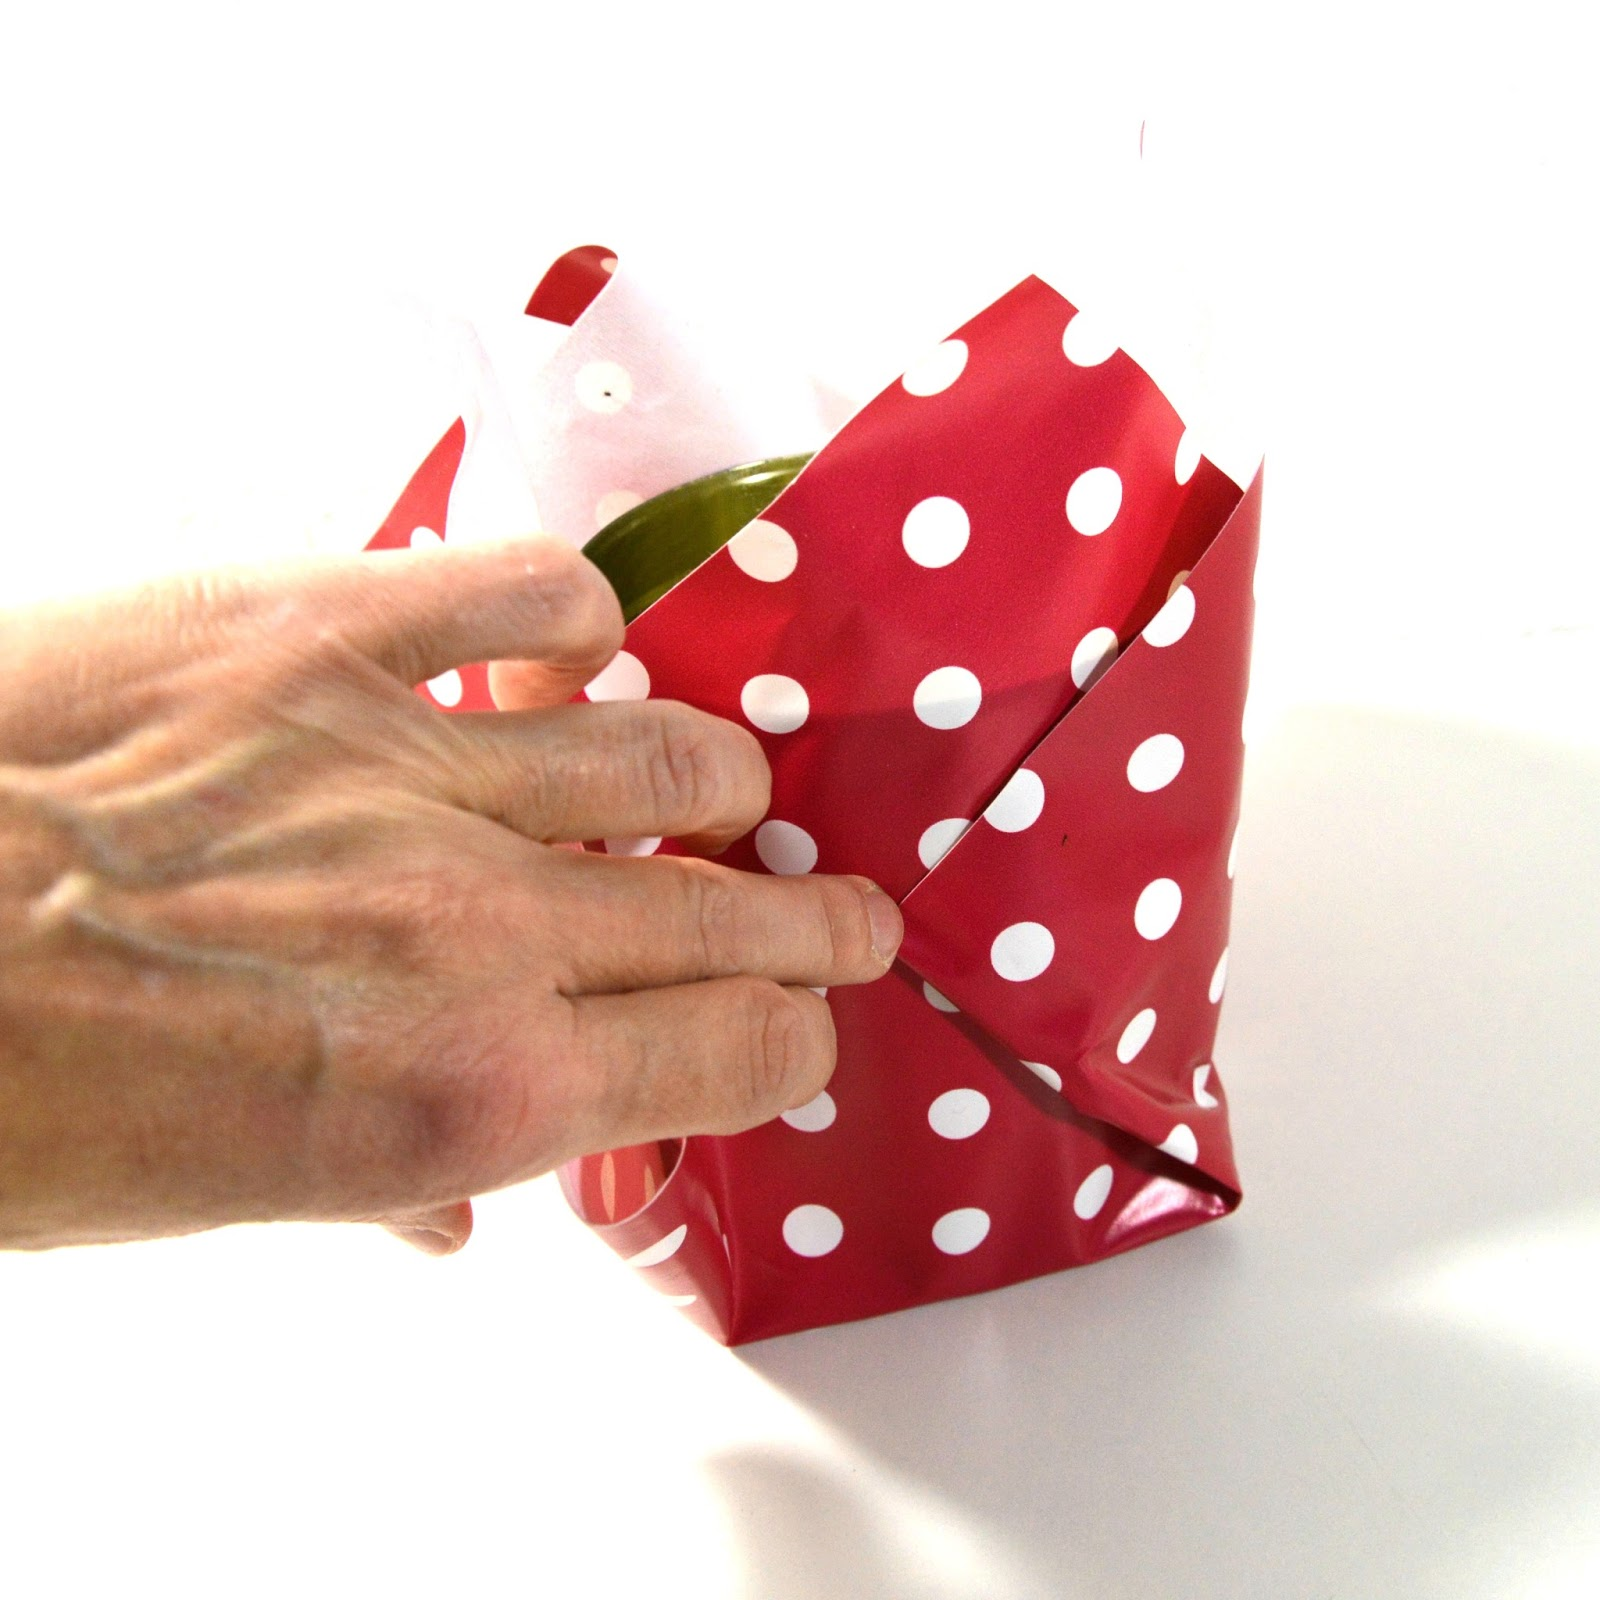 In folie einpacken blumentopf Blumentopf bekleben